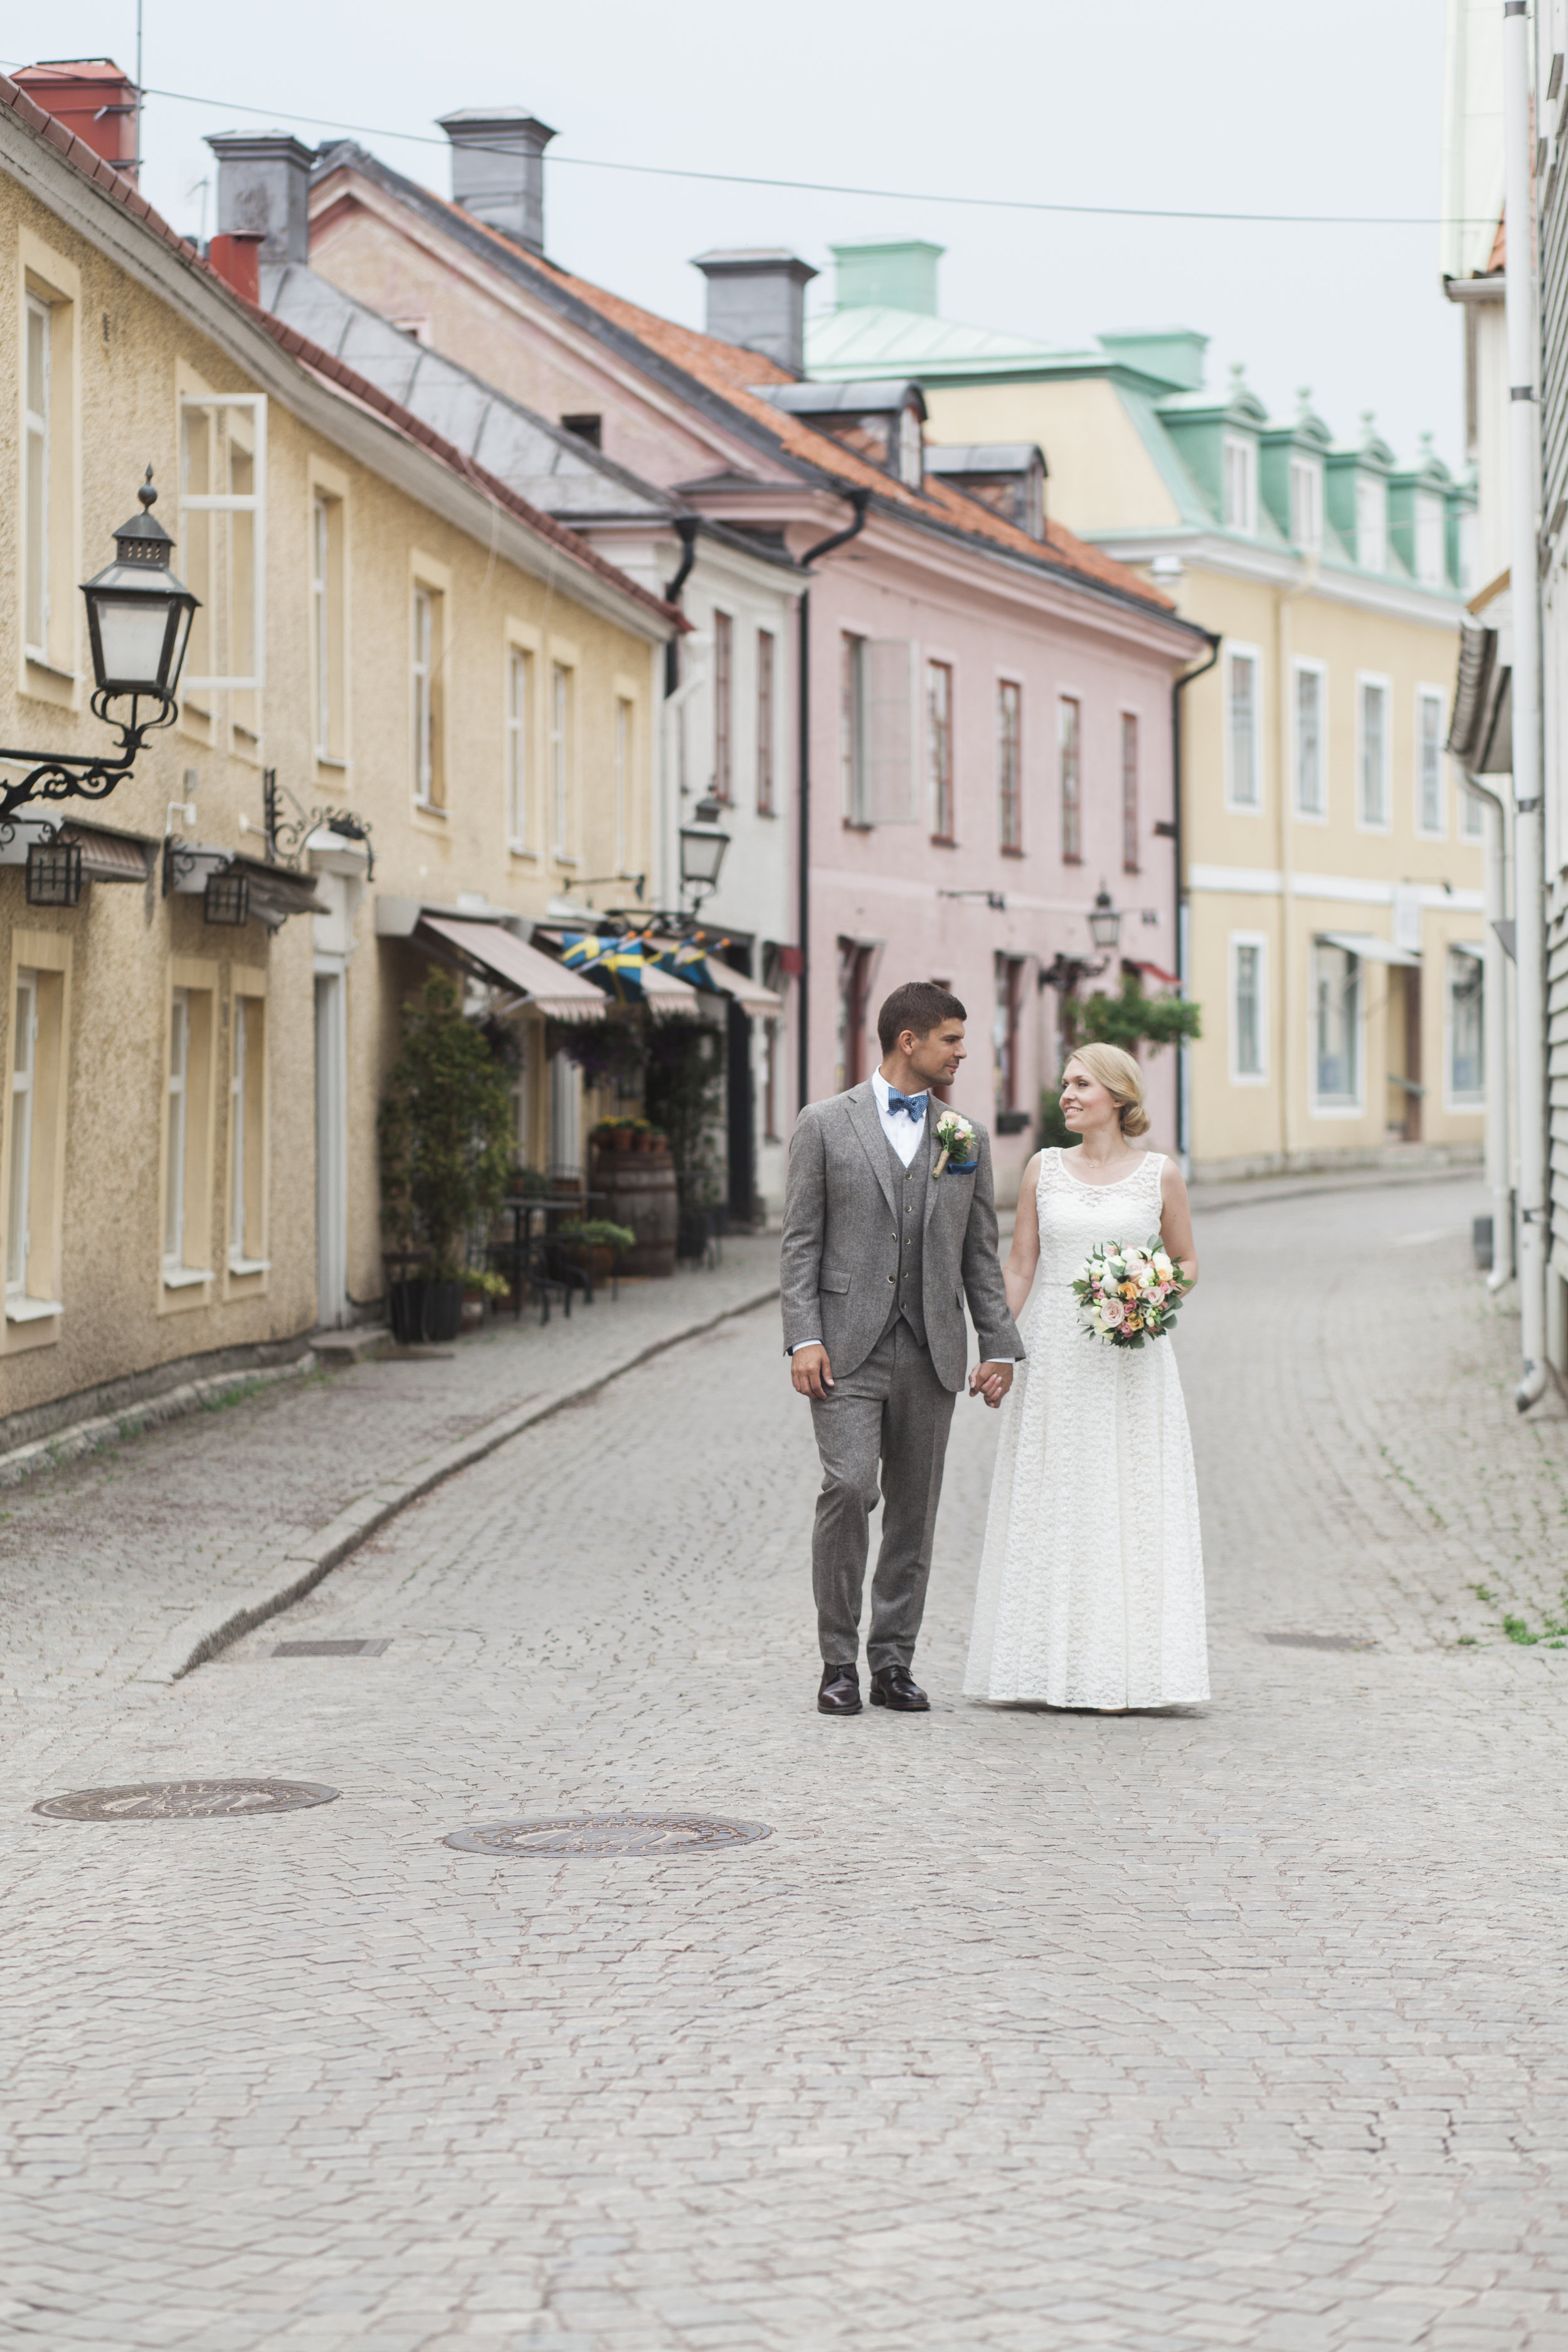 Bröllop-147.jpg